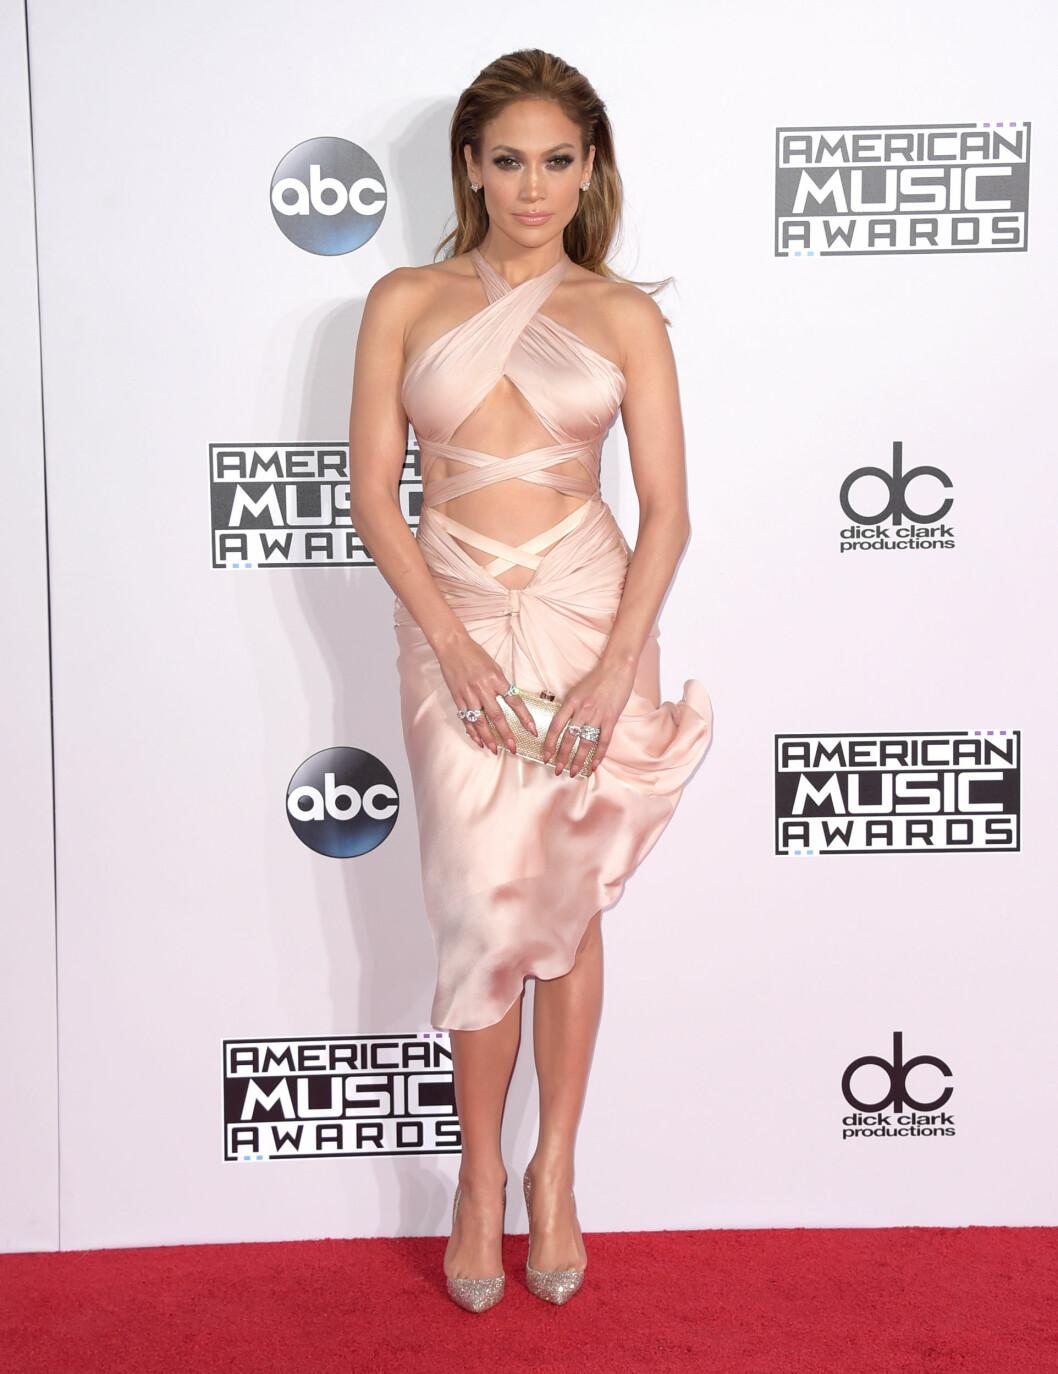 Jennifer Lopez Foto: insight media/All Over Press